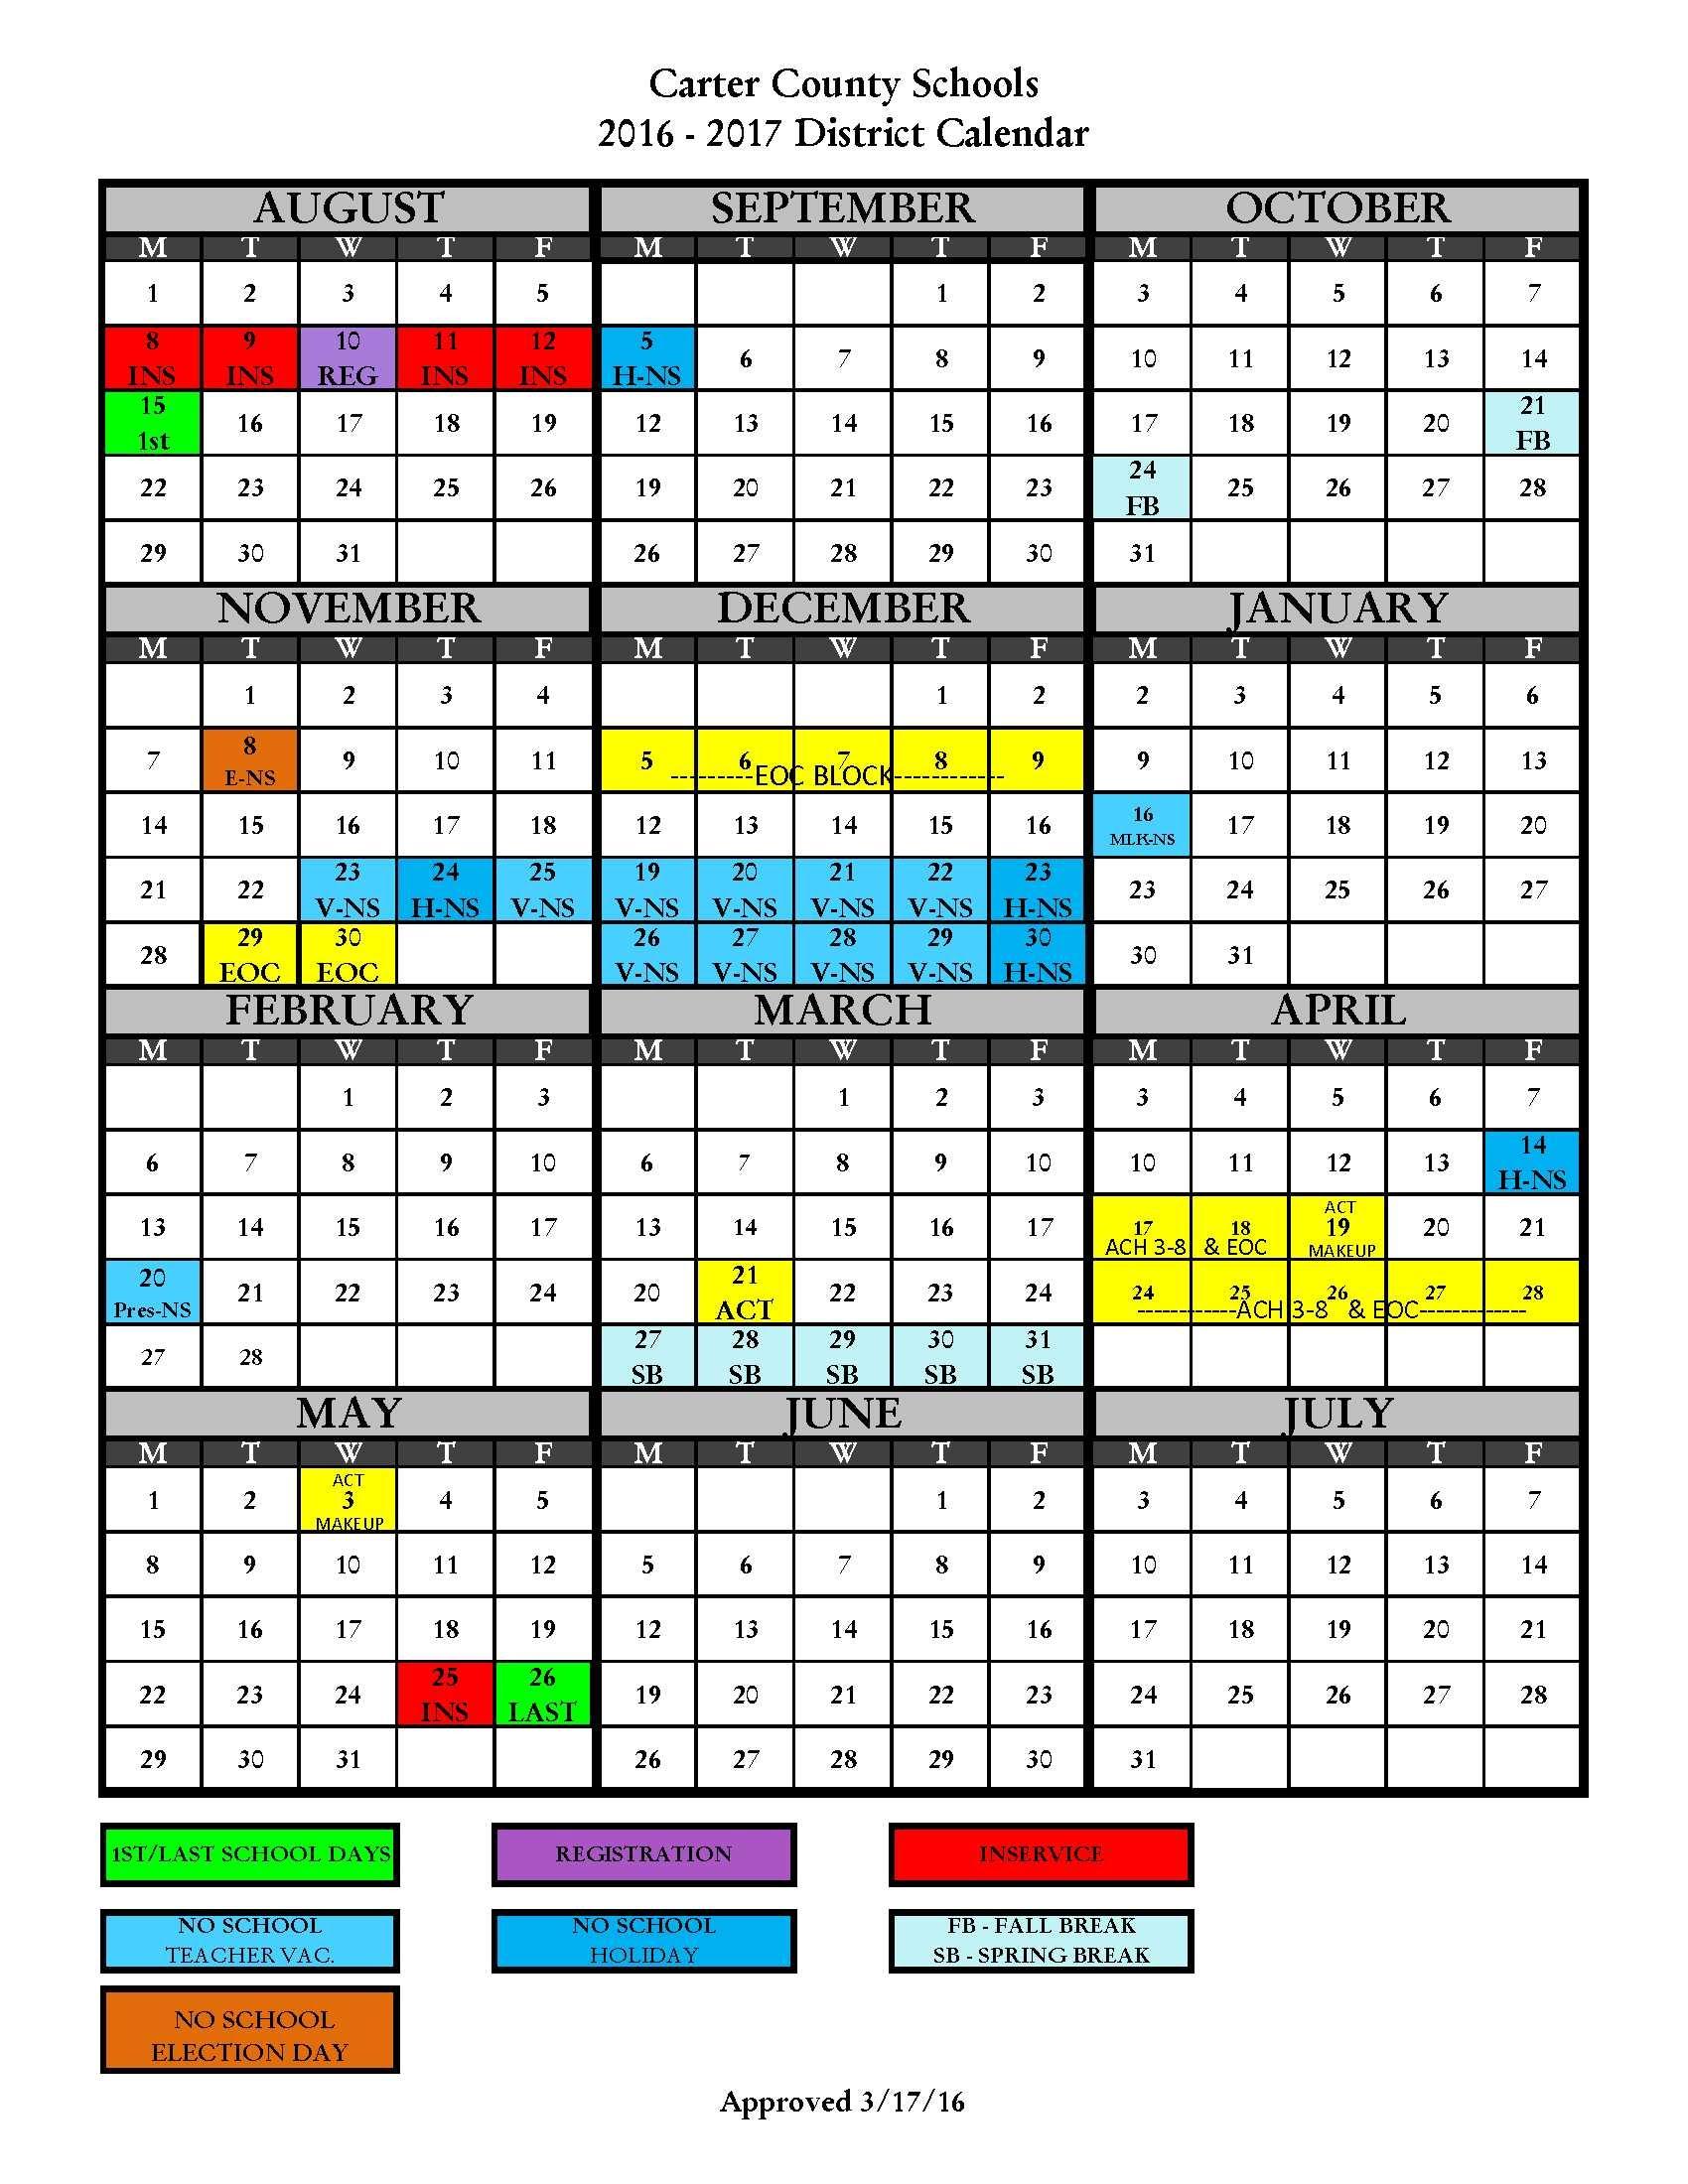 2016-2017 District Calendar - Carter County Schools intended for Alachua School Board Calendar